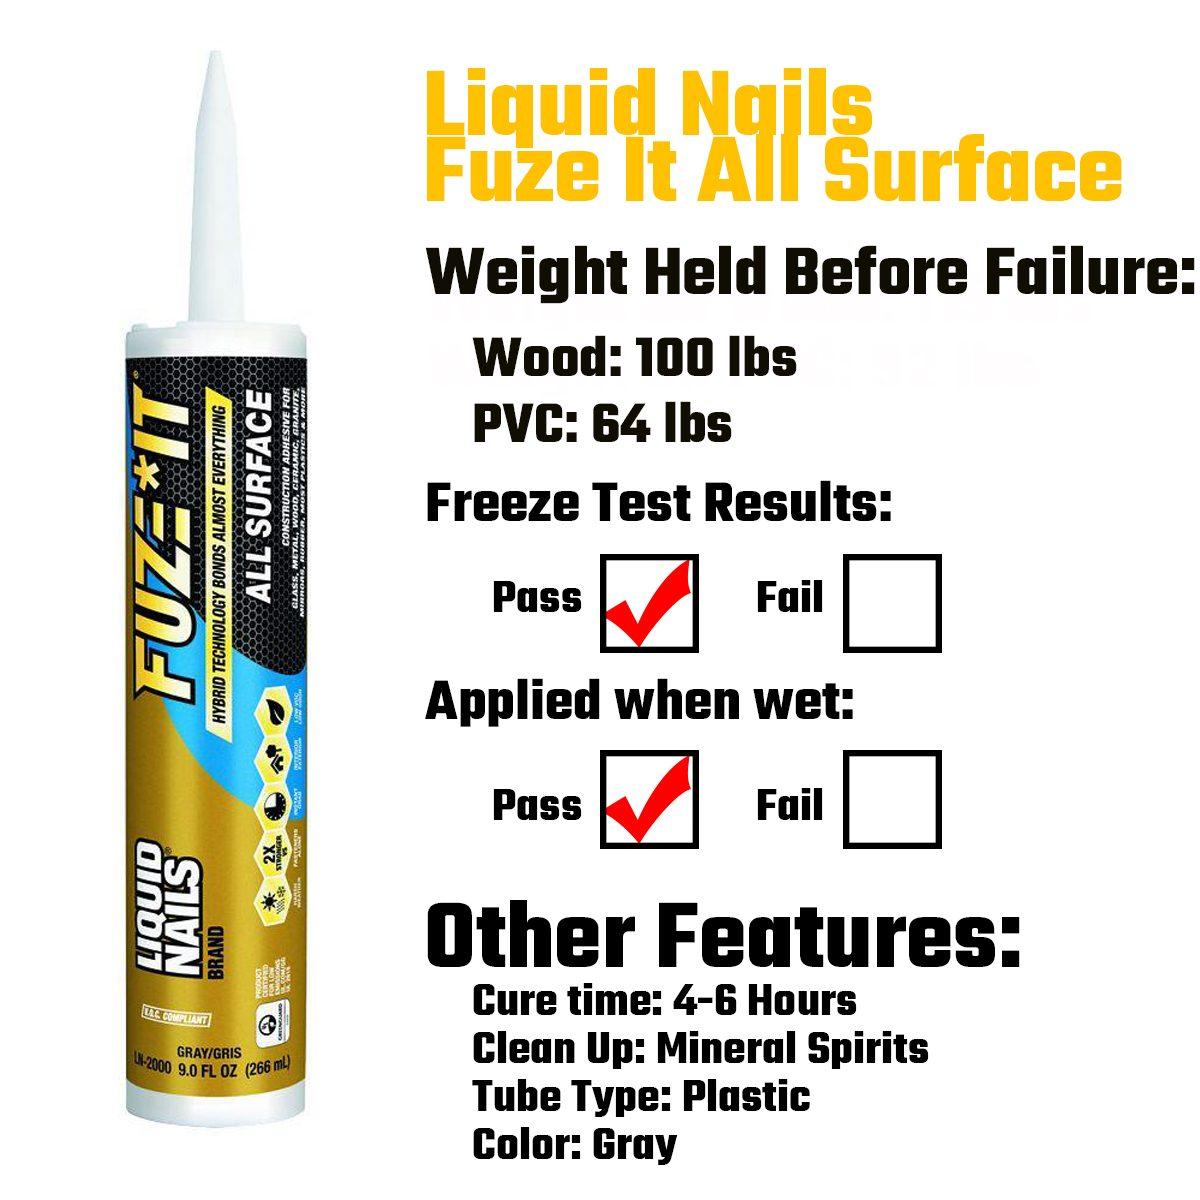 Liquid Nails Fuze It All Surfaces